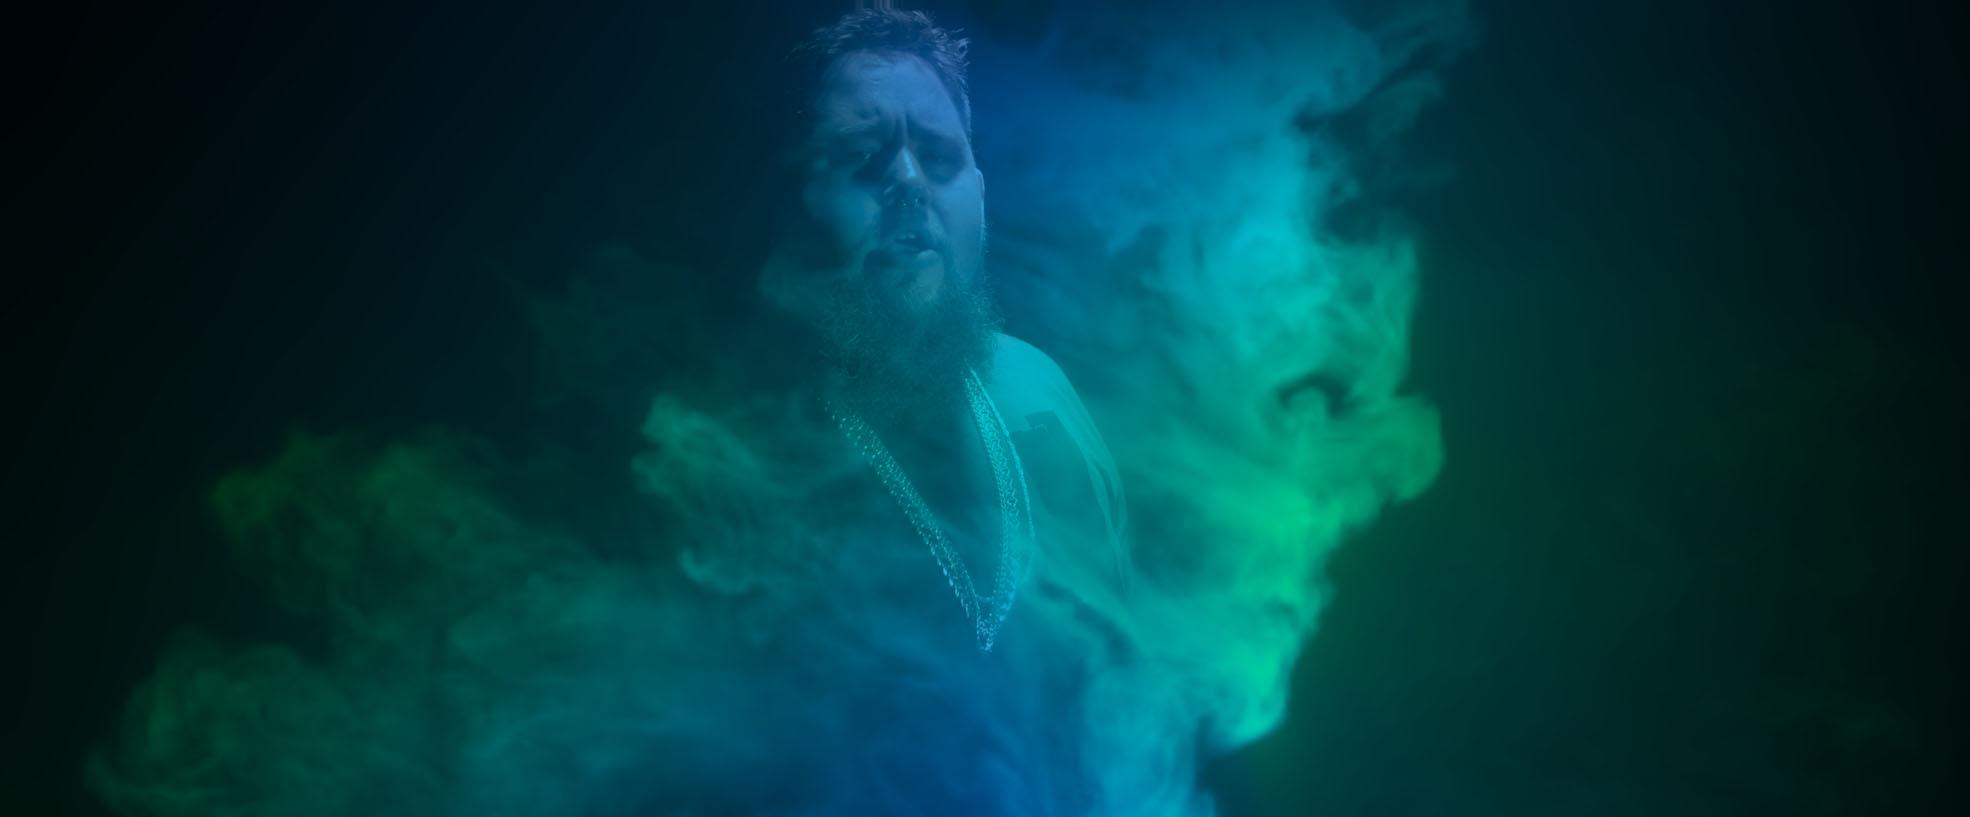 STANDARDFORIEGN BEGGARS FT. RAG'N'BONE MAN - Music Video and Visual Effects